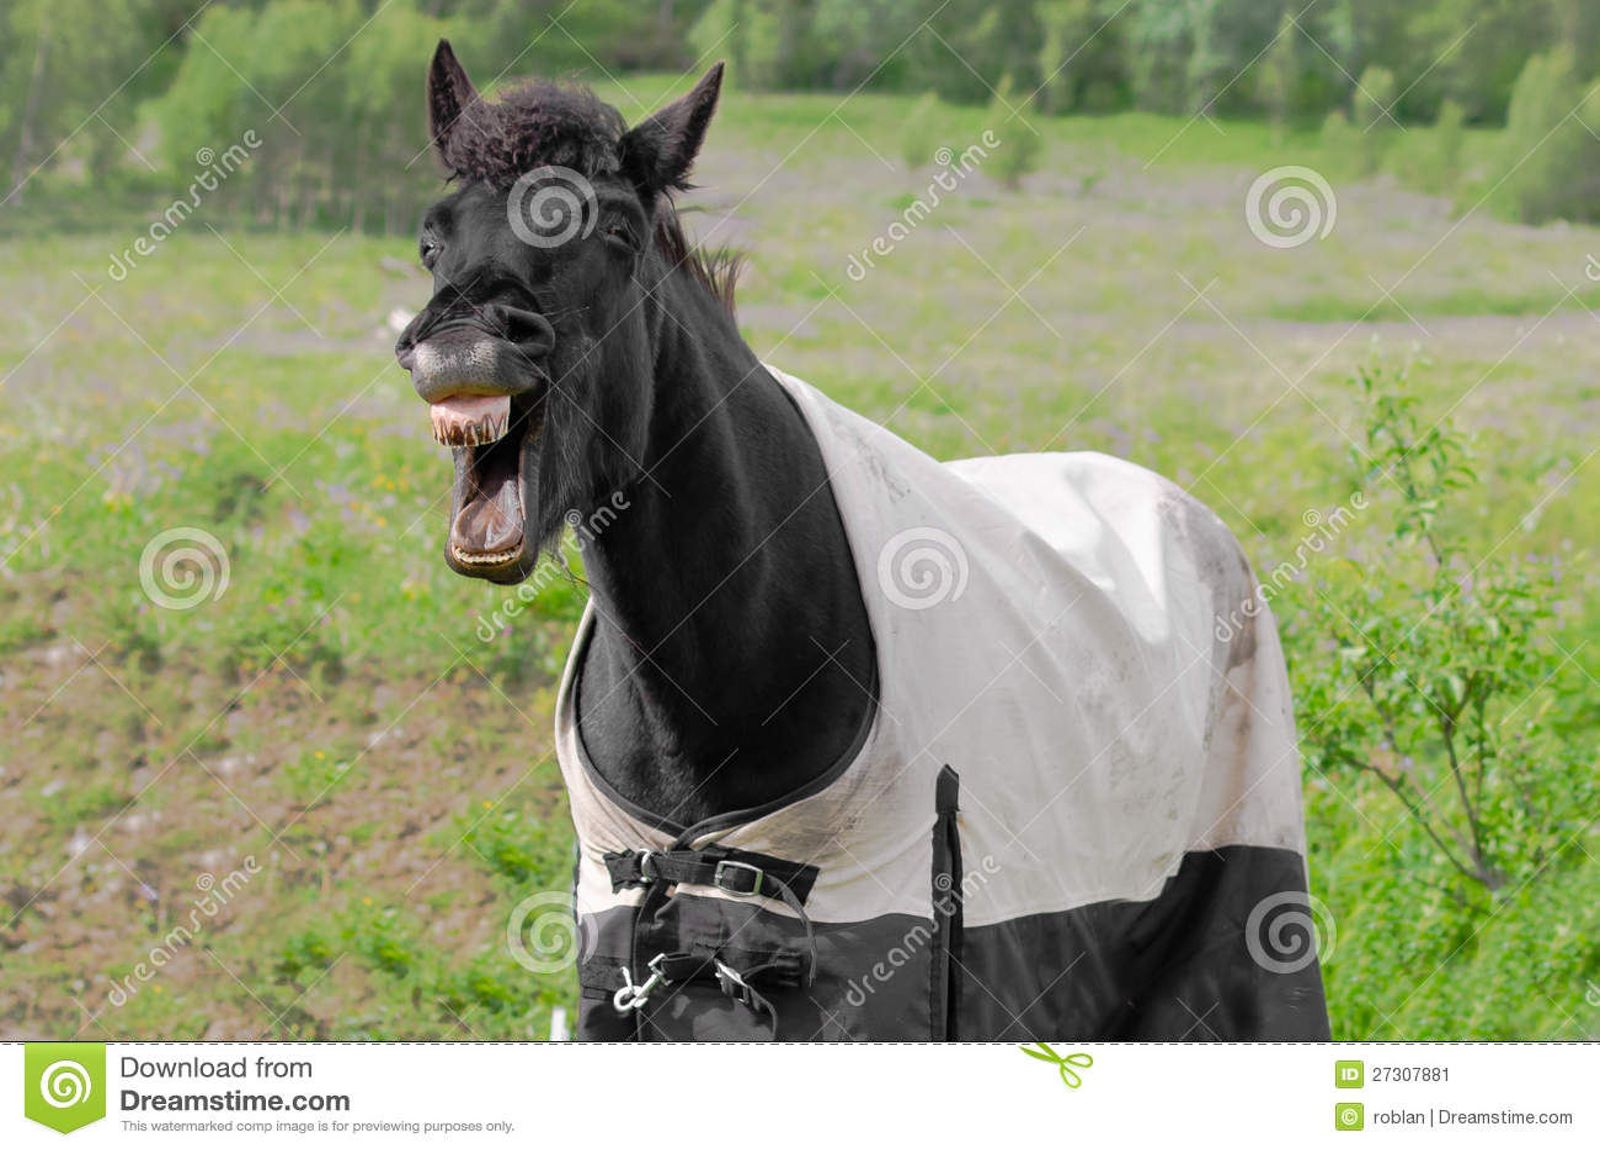 Laughing horse stock image. Image of happy, loud, coat ... - photo#37